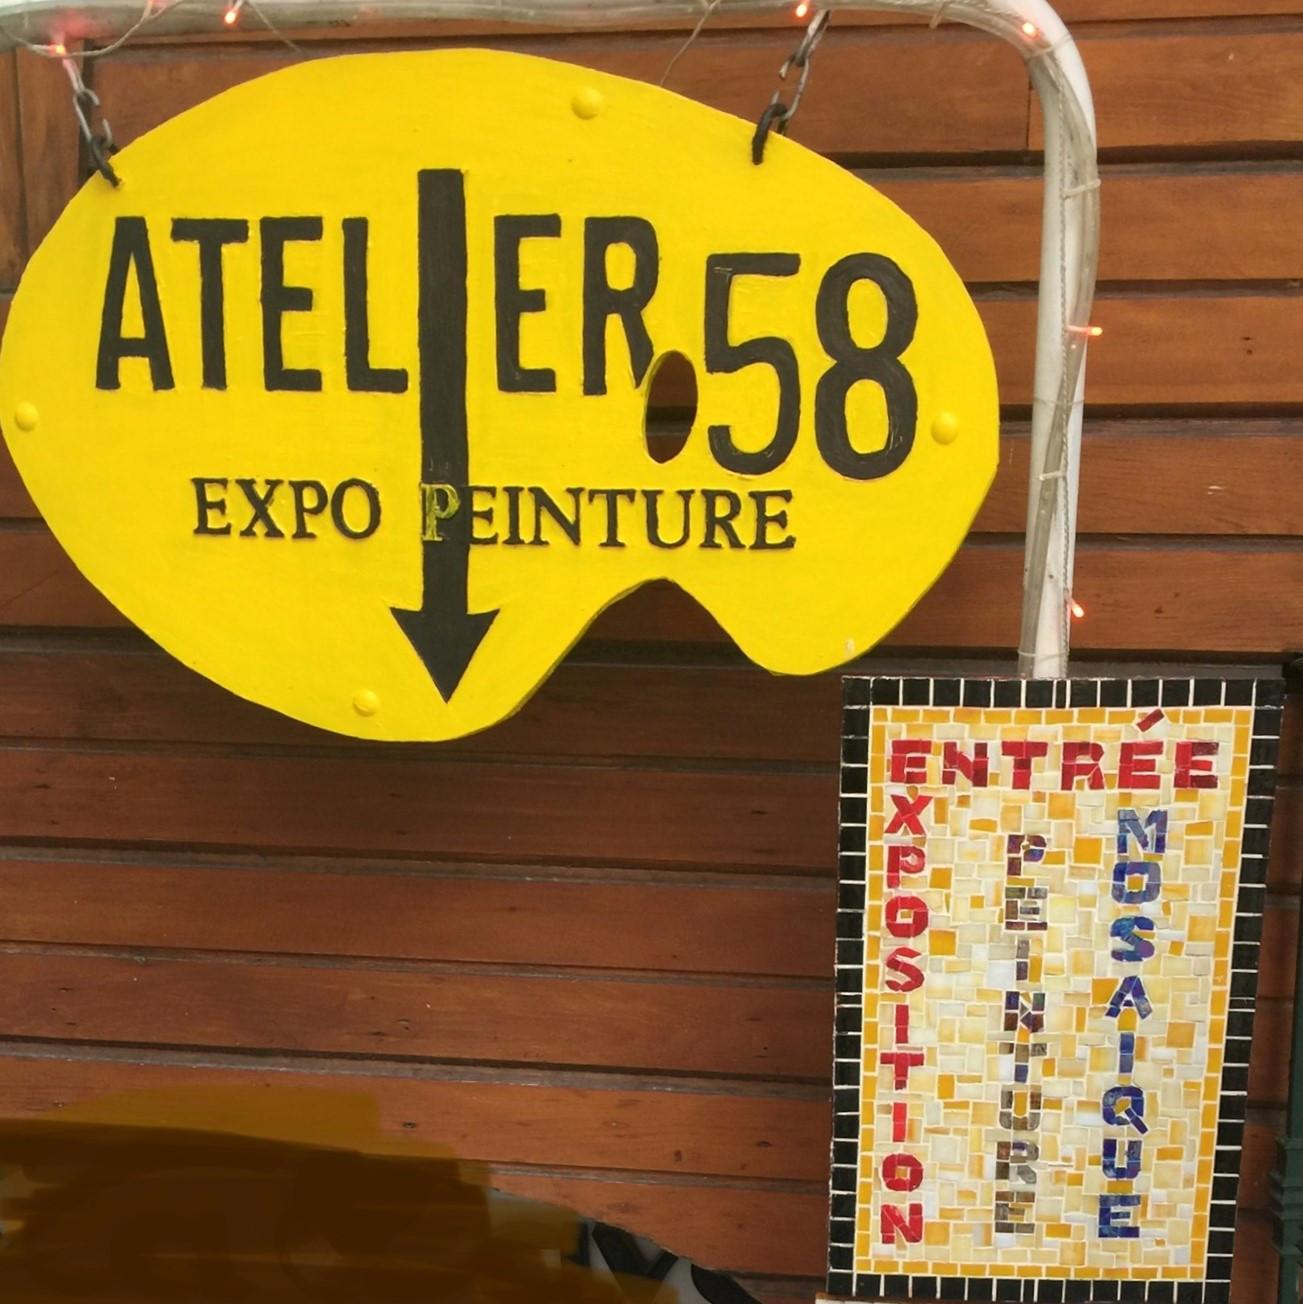 JACQUES HUTTLER - ATELIER 58